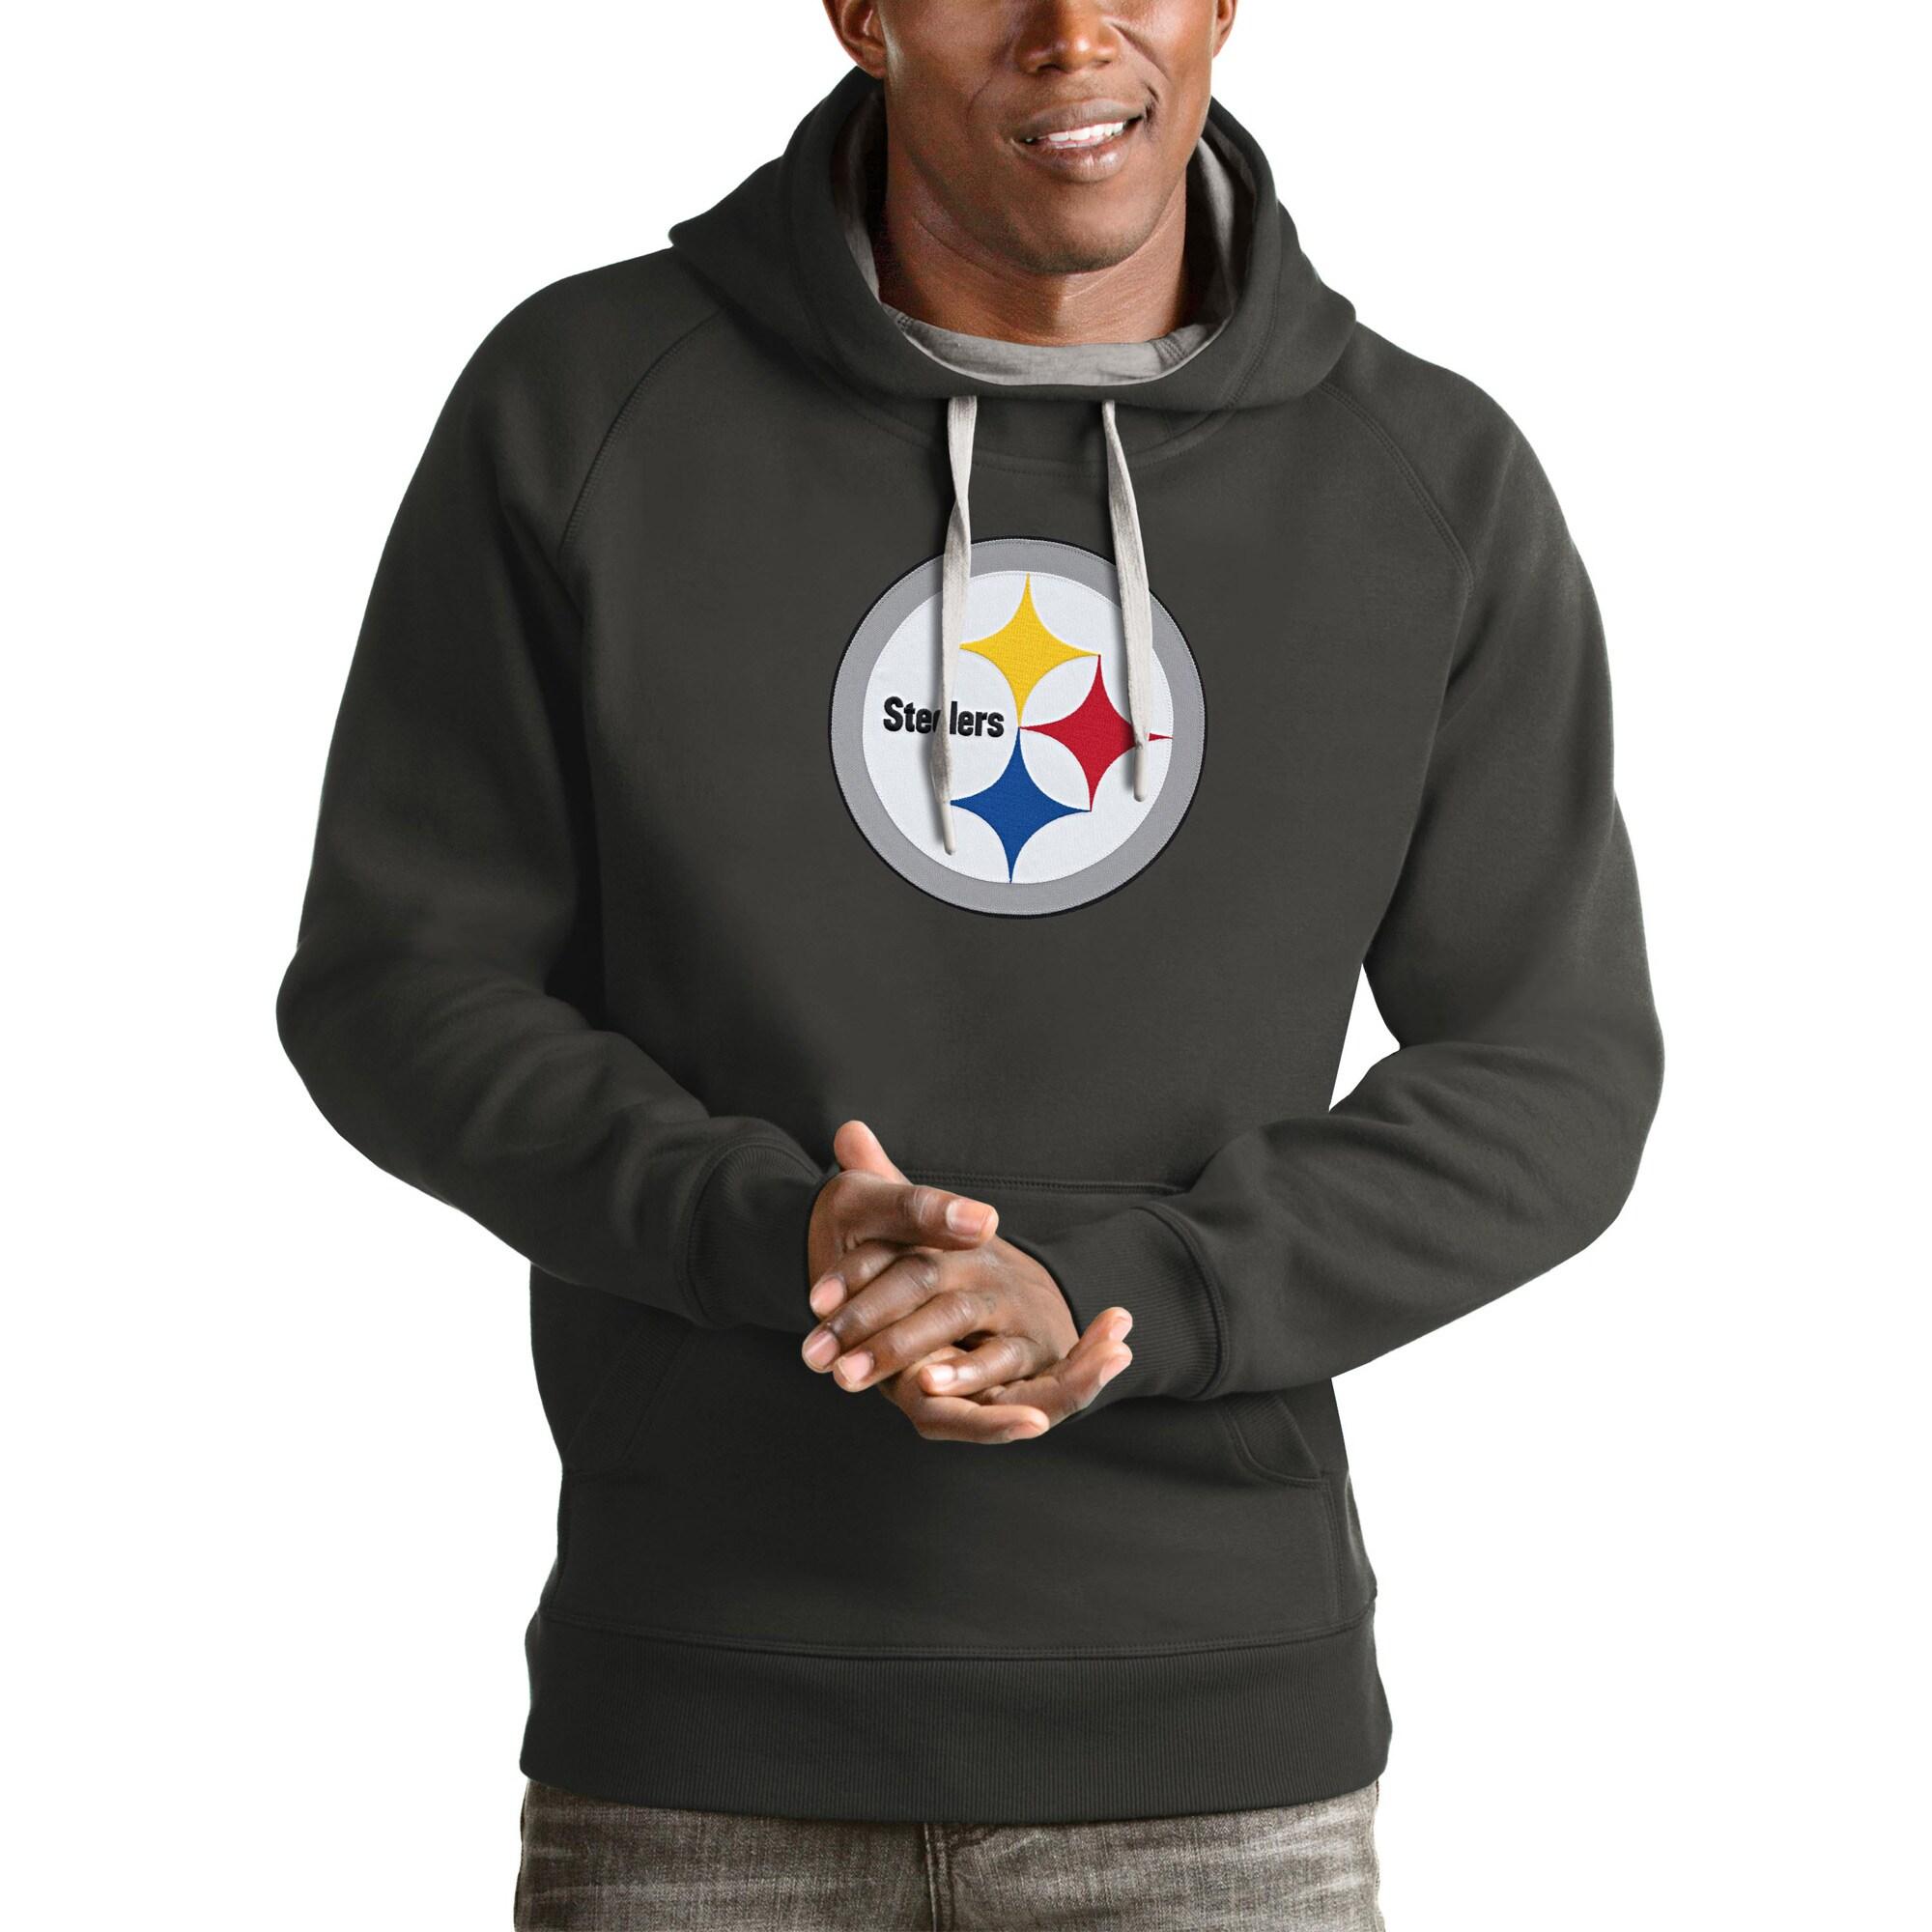 Pittsburgh Steelers Antigua Victory Pullover Hoodie - Charcoal